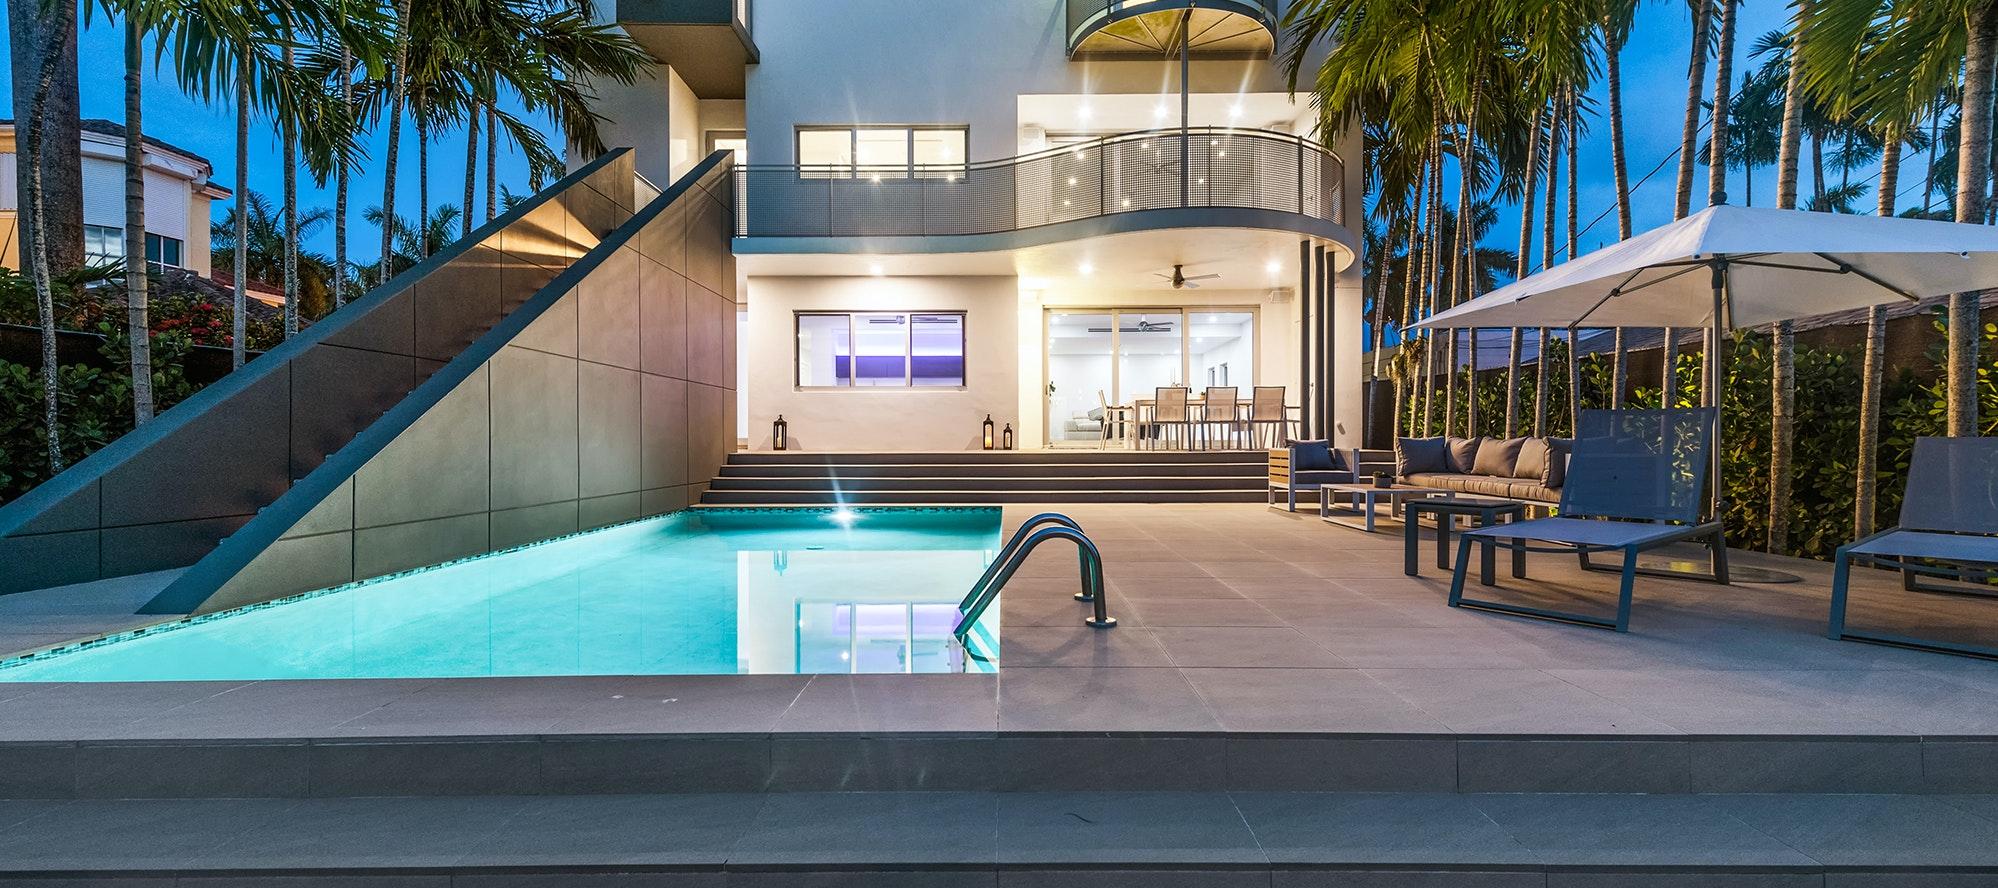 Villa Haven luxury rental in Coconut Grove